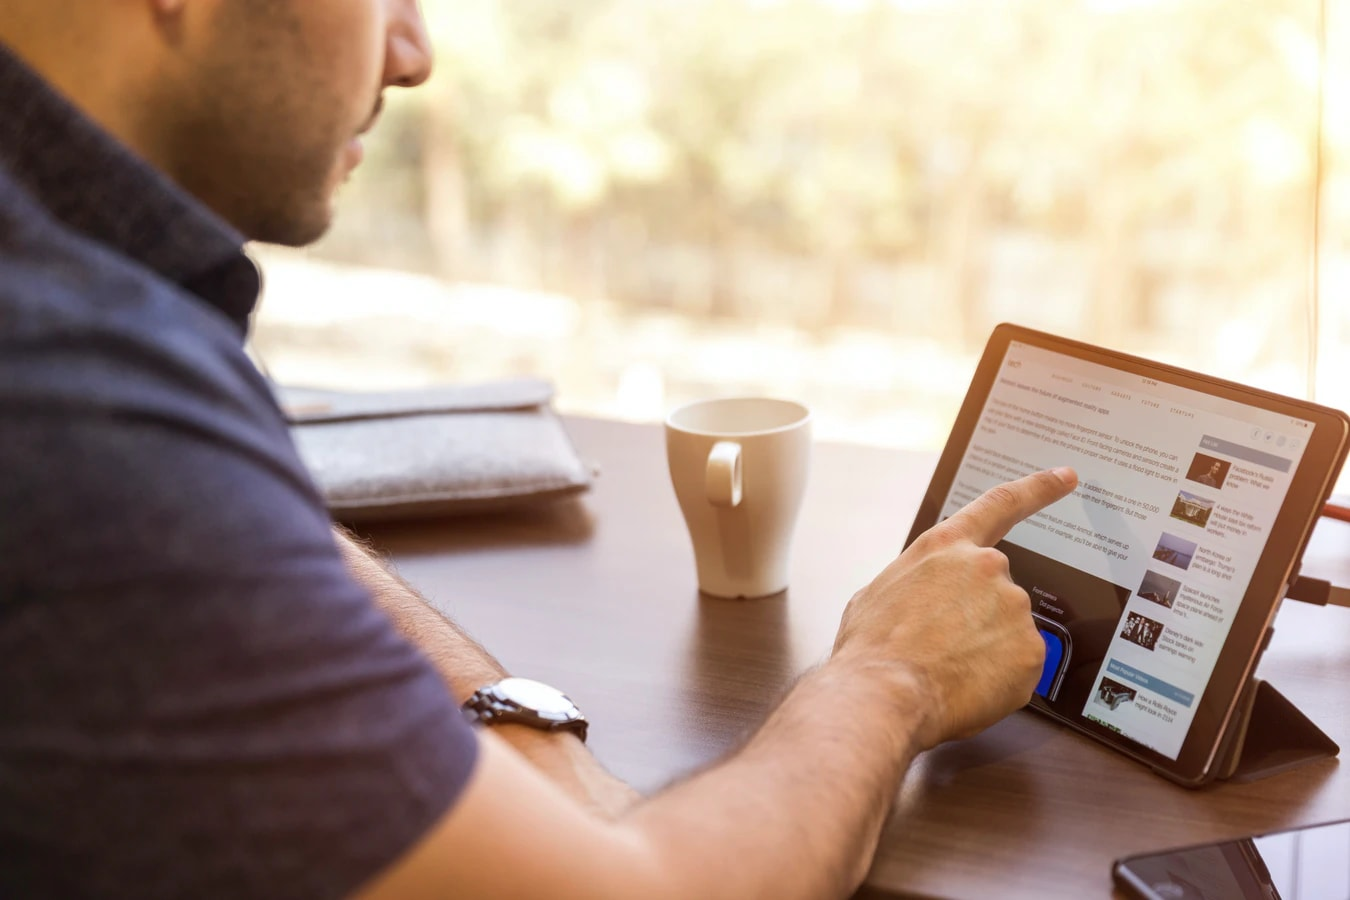 Affiliate Marketing ist auf LinkedIn Learning unter den Top 10 Skills